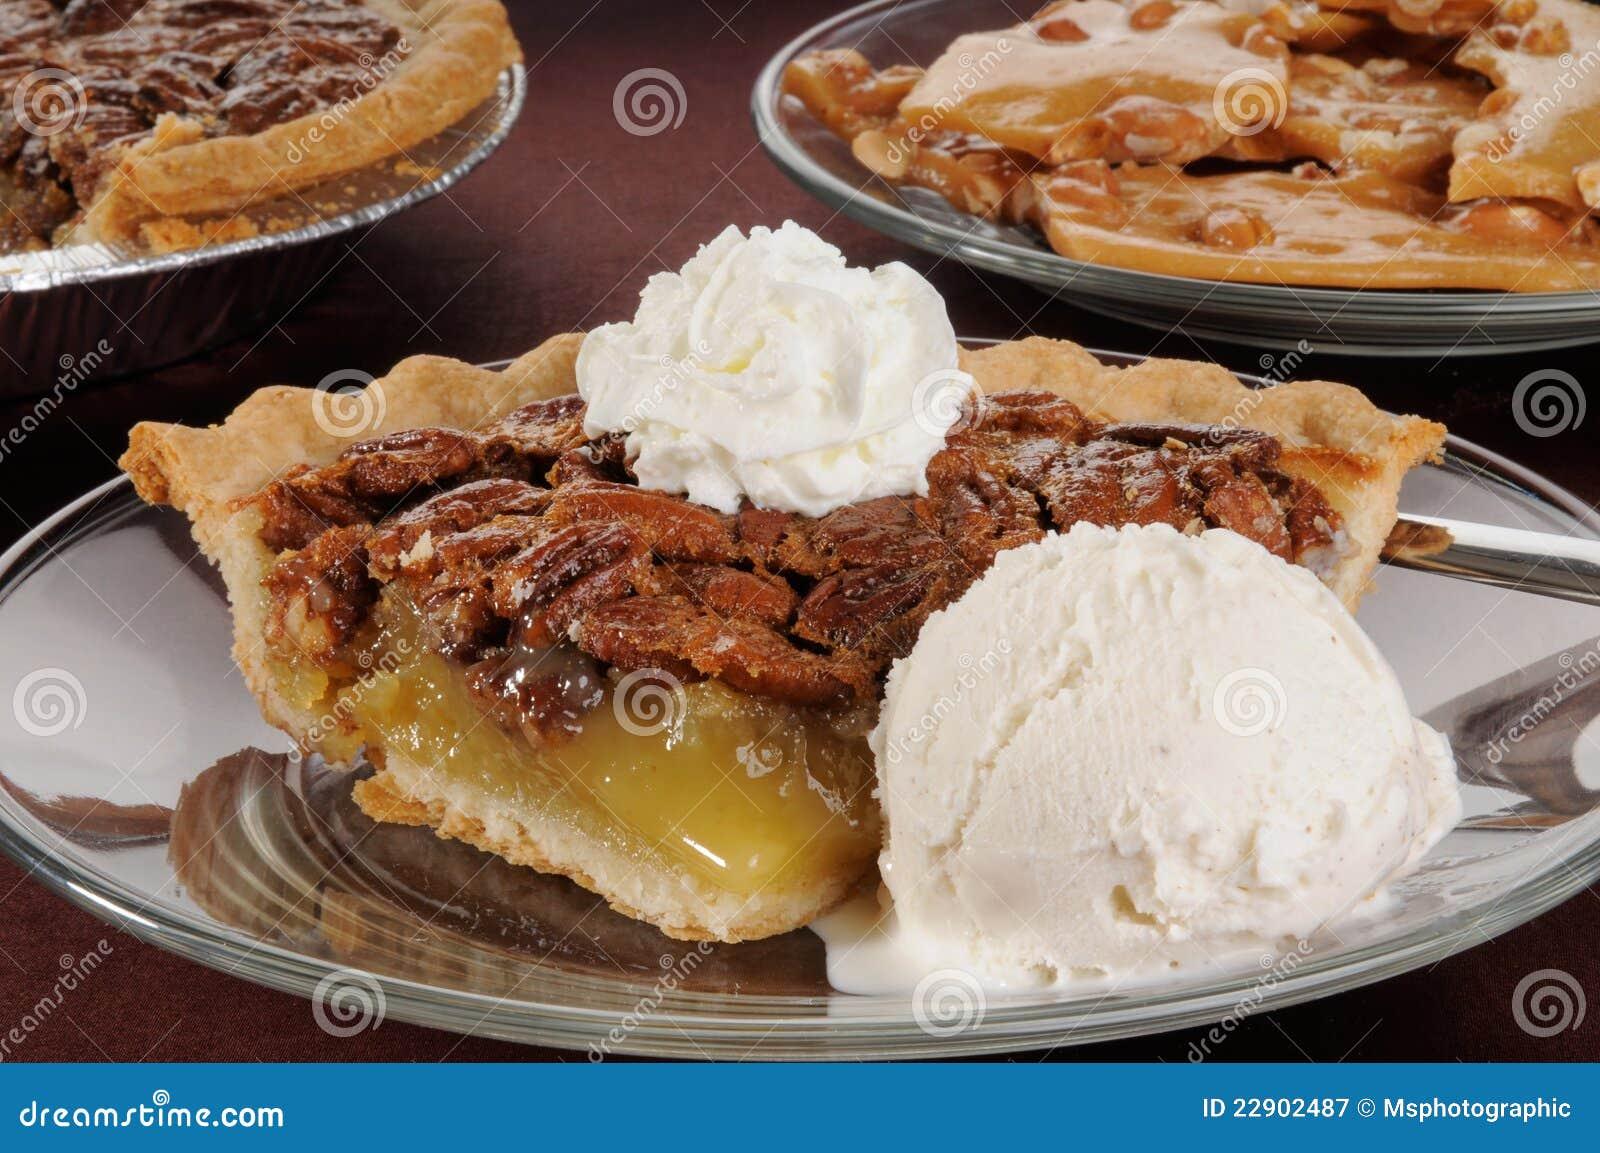 Pecan pie with ice cream stock image. Image of golden ...